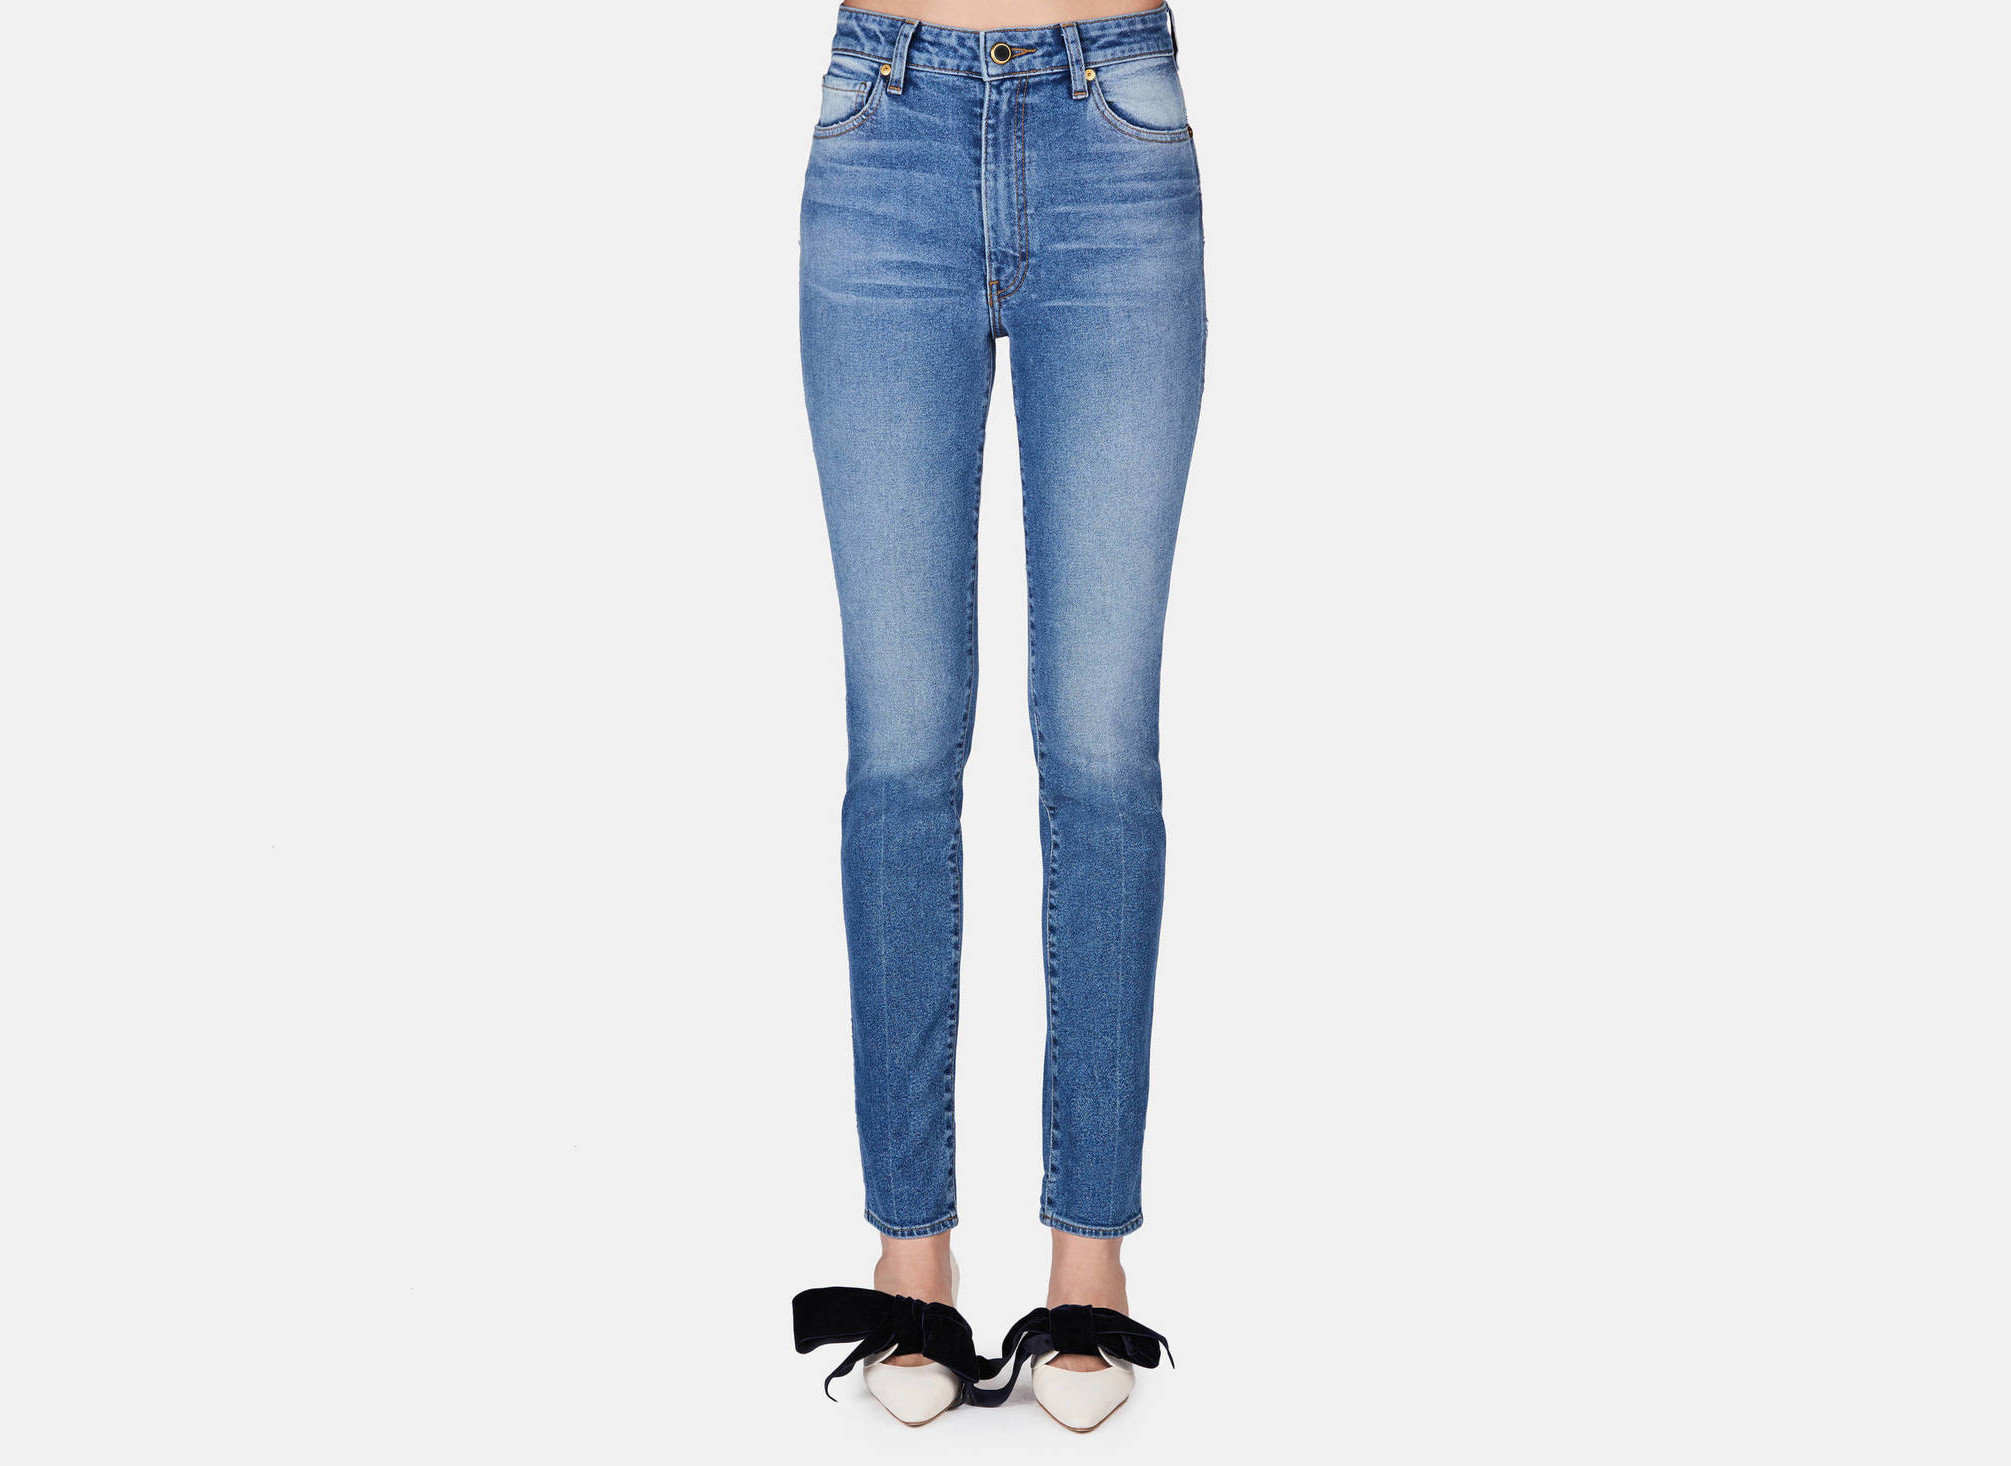 Offbeat jeans person clothing denim trouser trousers pocket abdomen textile pattern trunk